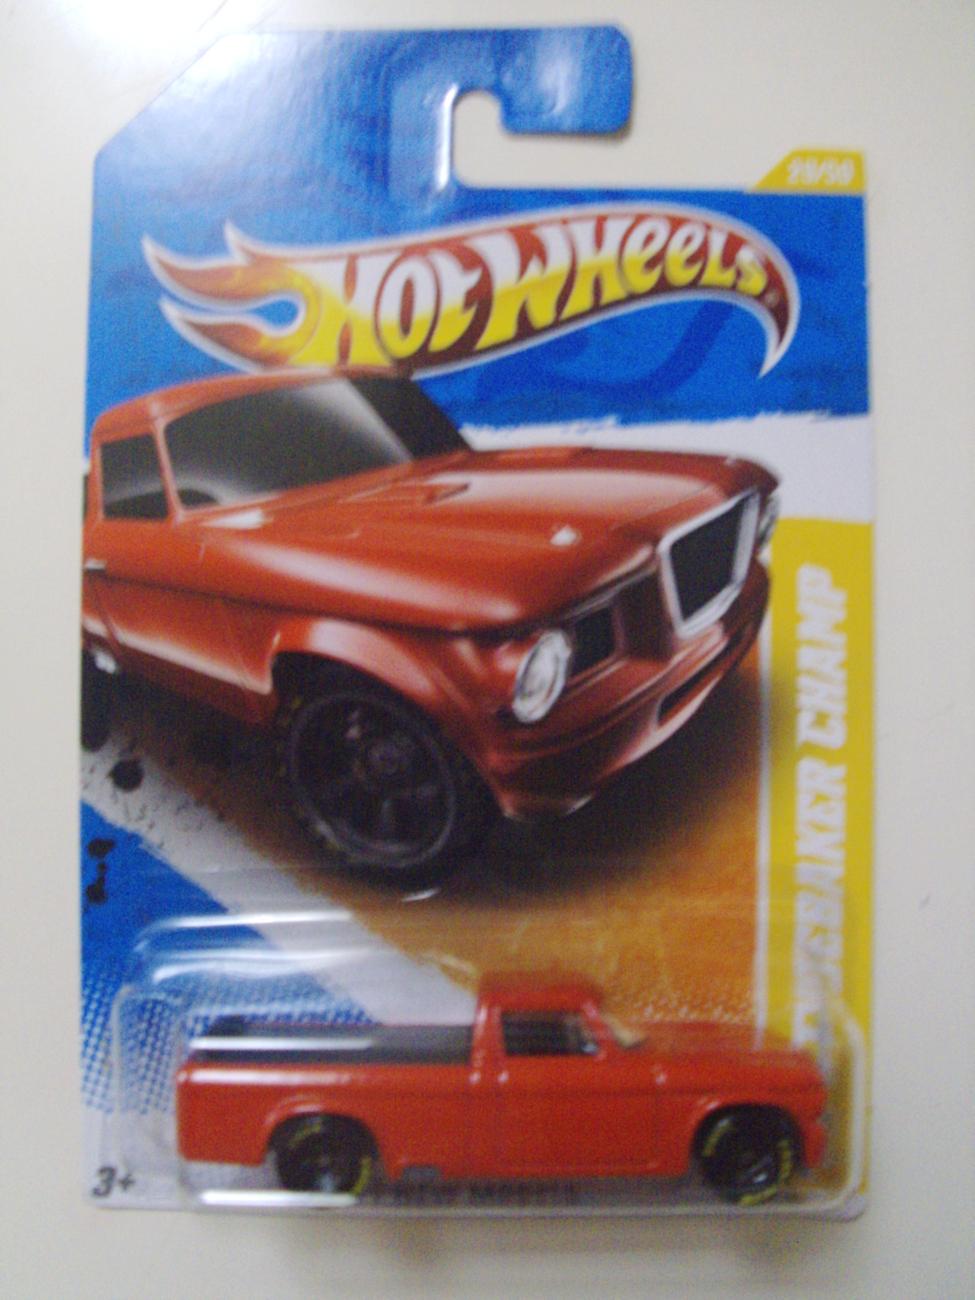 2011 Hot Wheels New Models '63 Studebaker Champ truck car - New